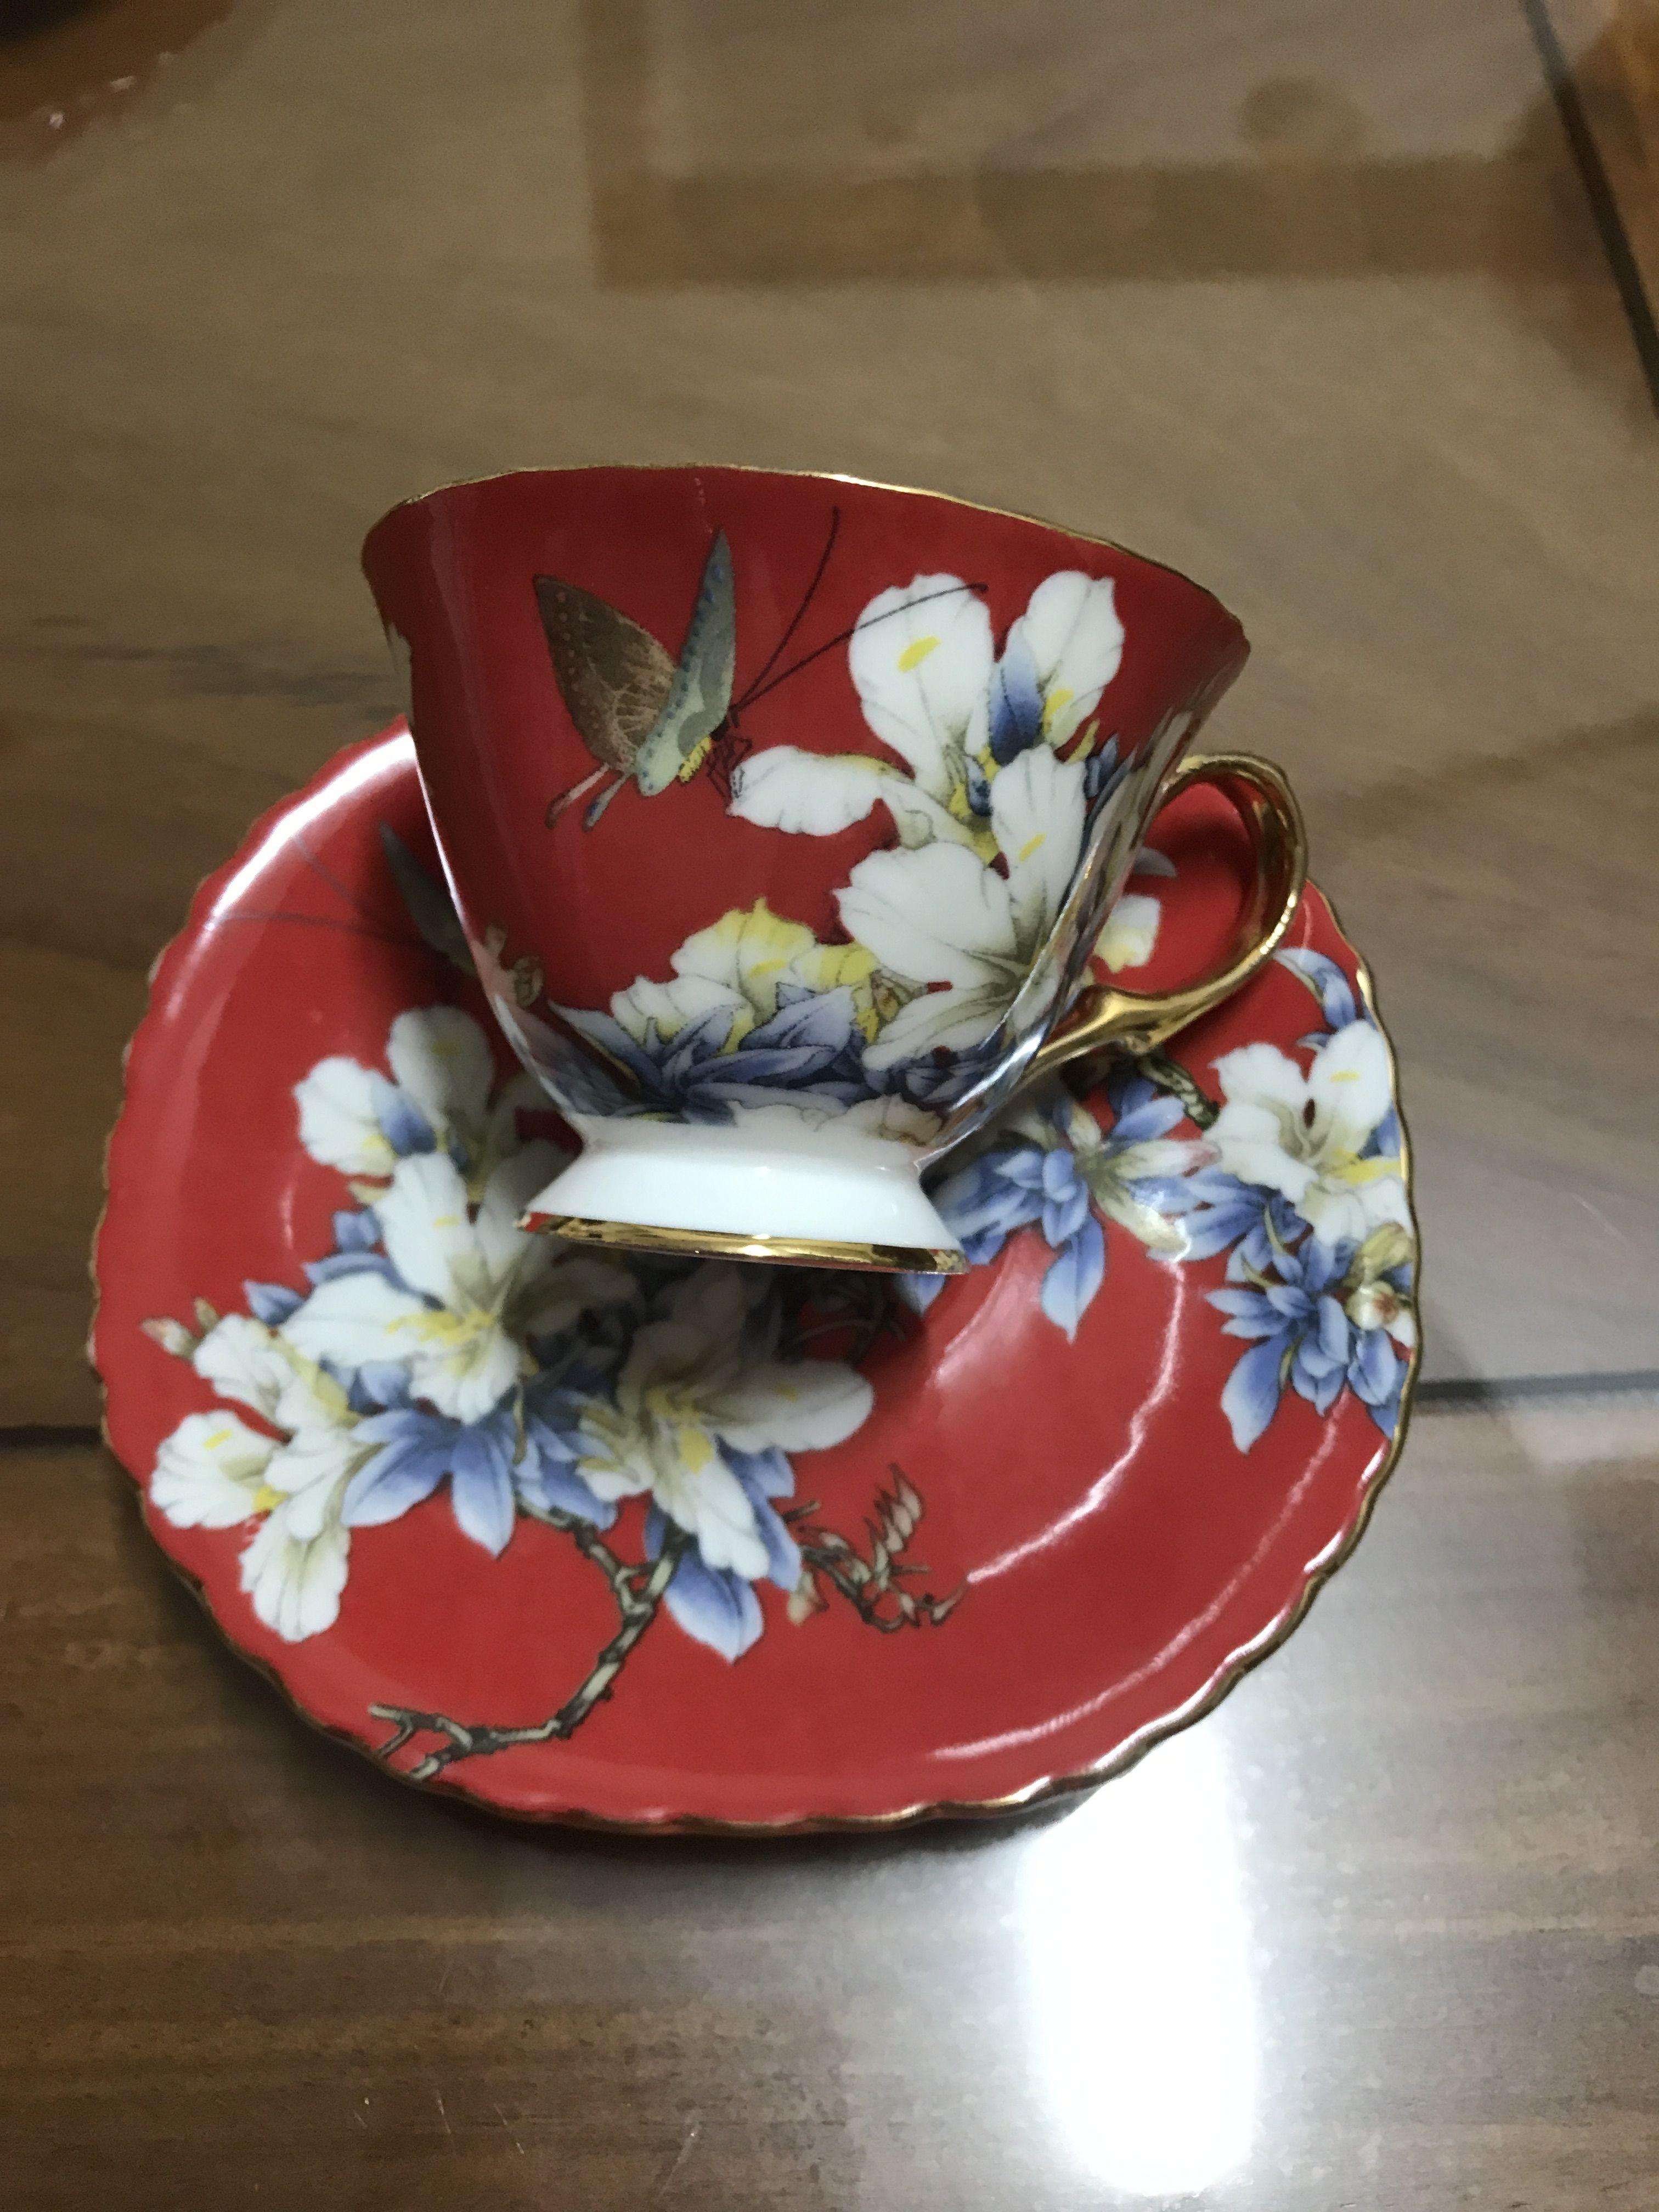 Royal albert bone china tea cup amp saucer winsome pattern ebay - Bone China Tea Cupstea Cup Saucerroyal Albertfine Chinateacupstea Timevintage Tea Cupstea Partyraspberries